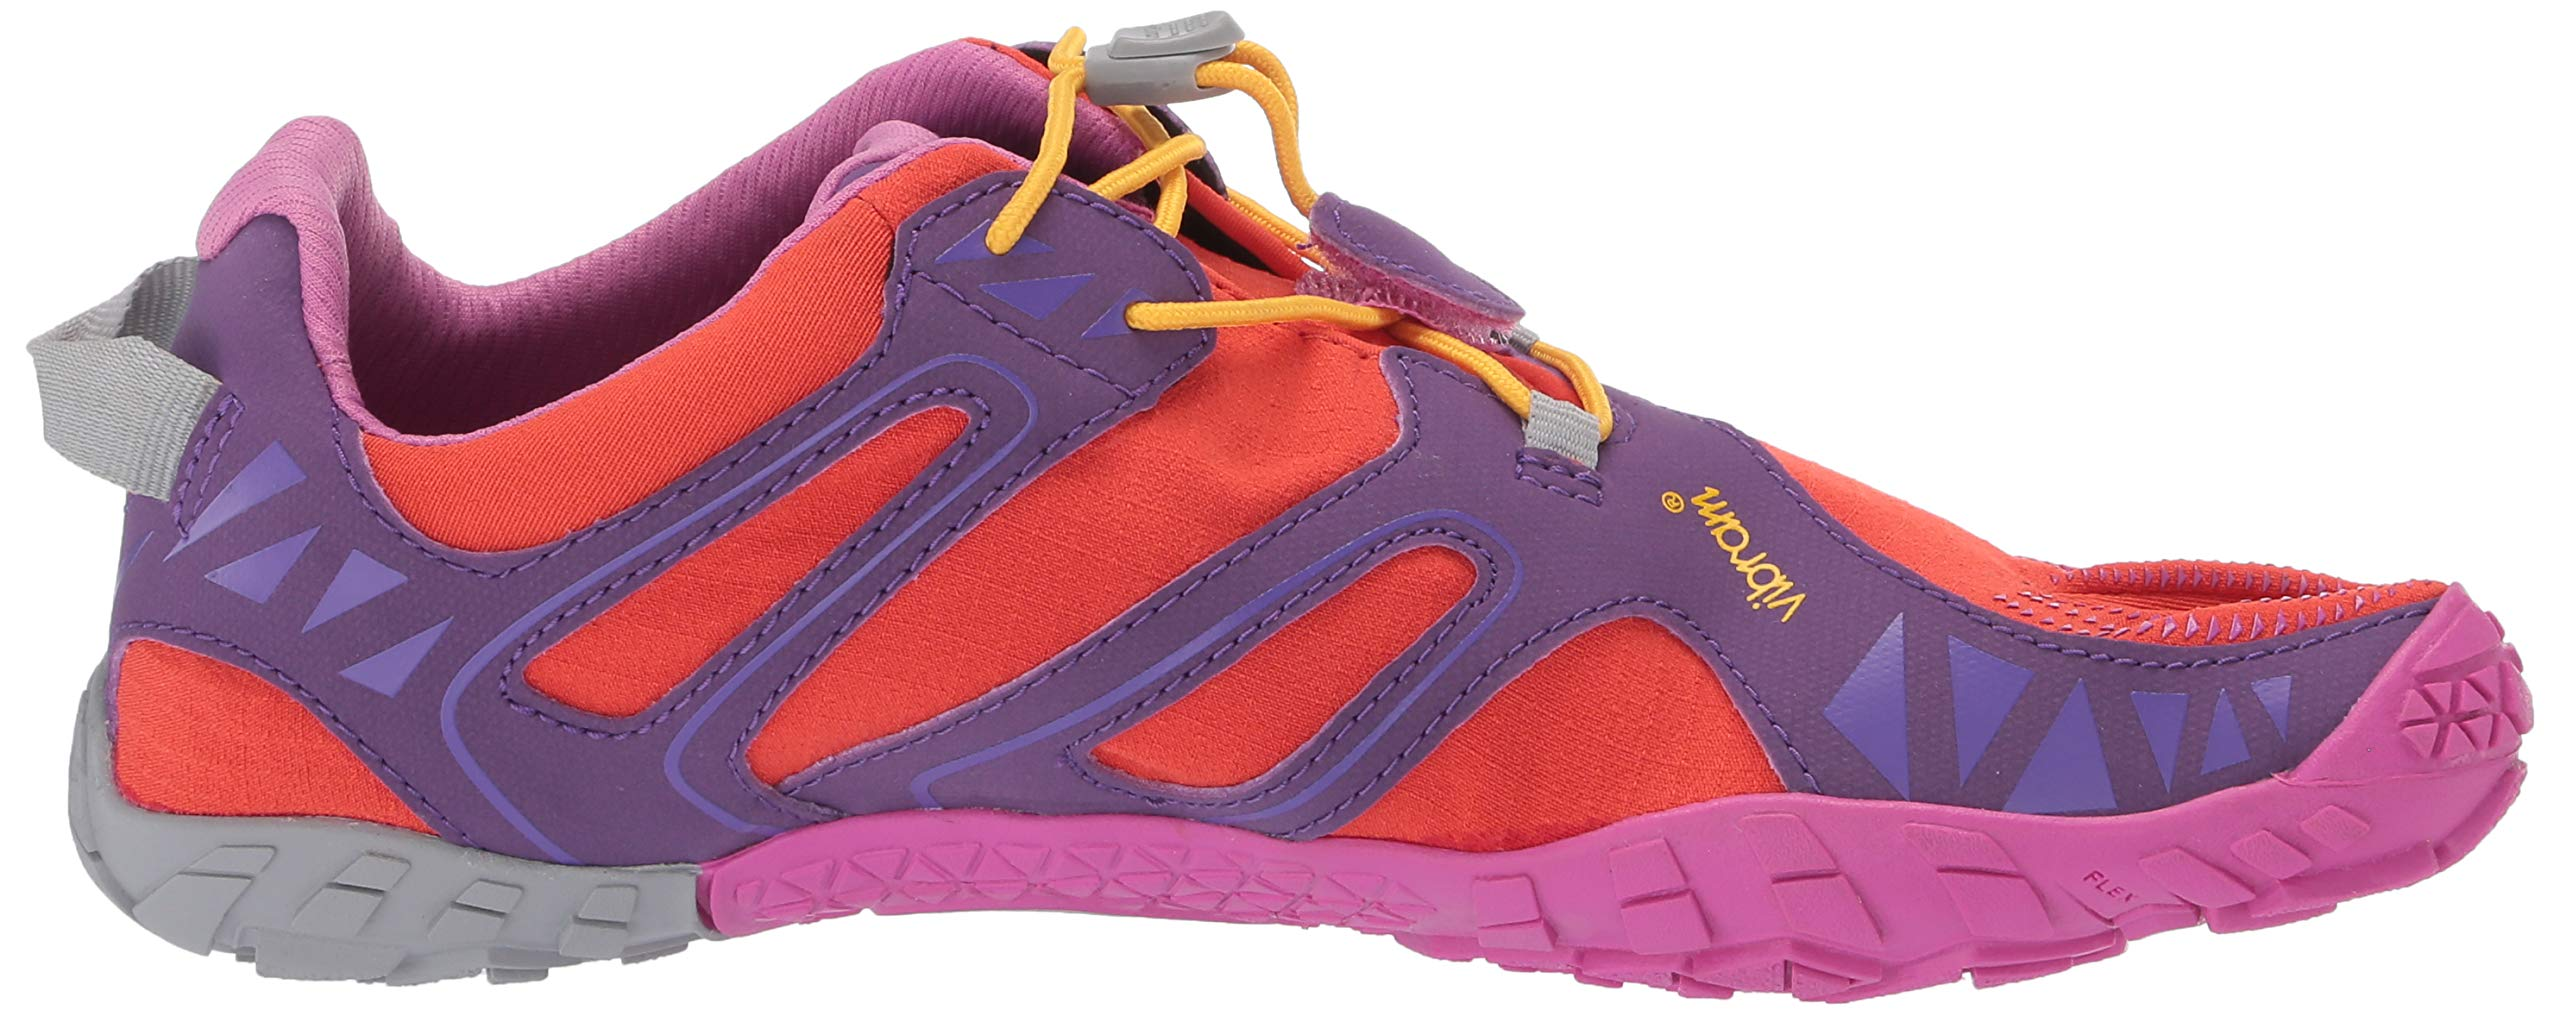 Vibram FiveFingers V-Trail, Women's Trail Running Shoes, Orange (Magenta/Orange), 6-6.5 UK (38 EU) by Vibram (Image #6)